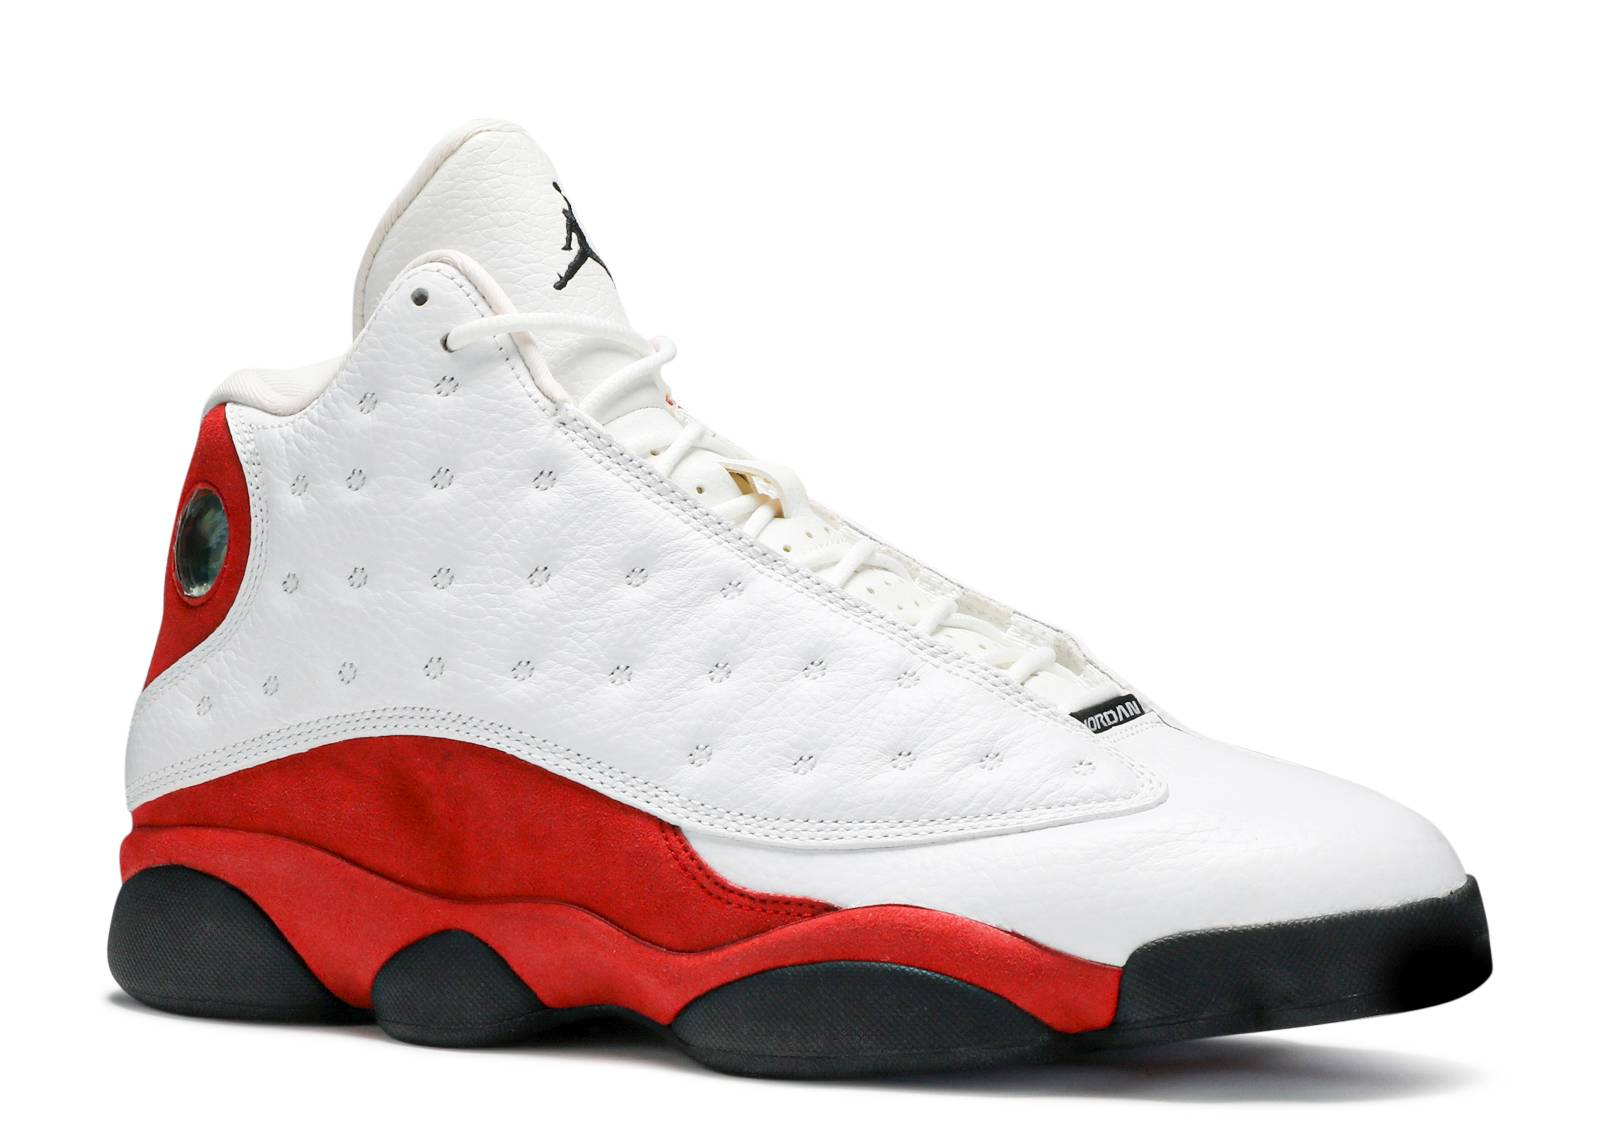 on sale 86bae aea64 Air Jordan 13 Retro